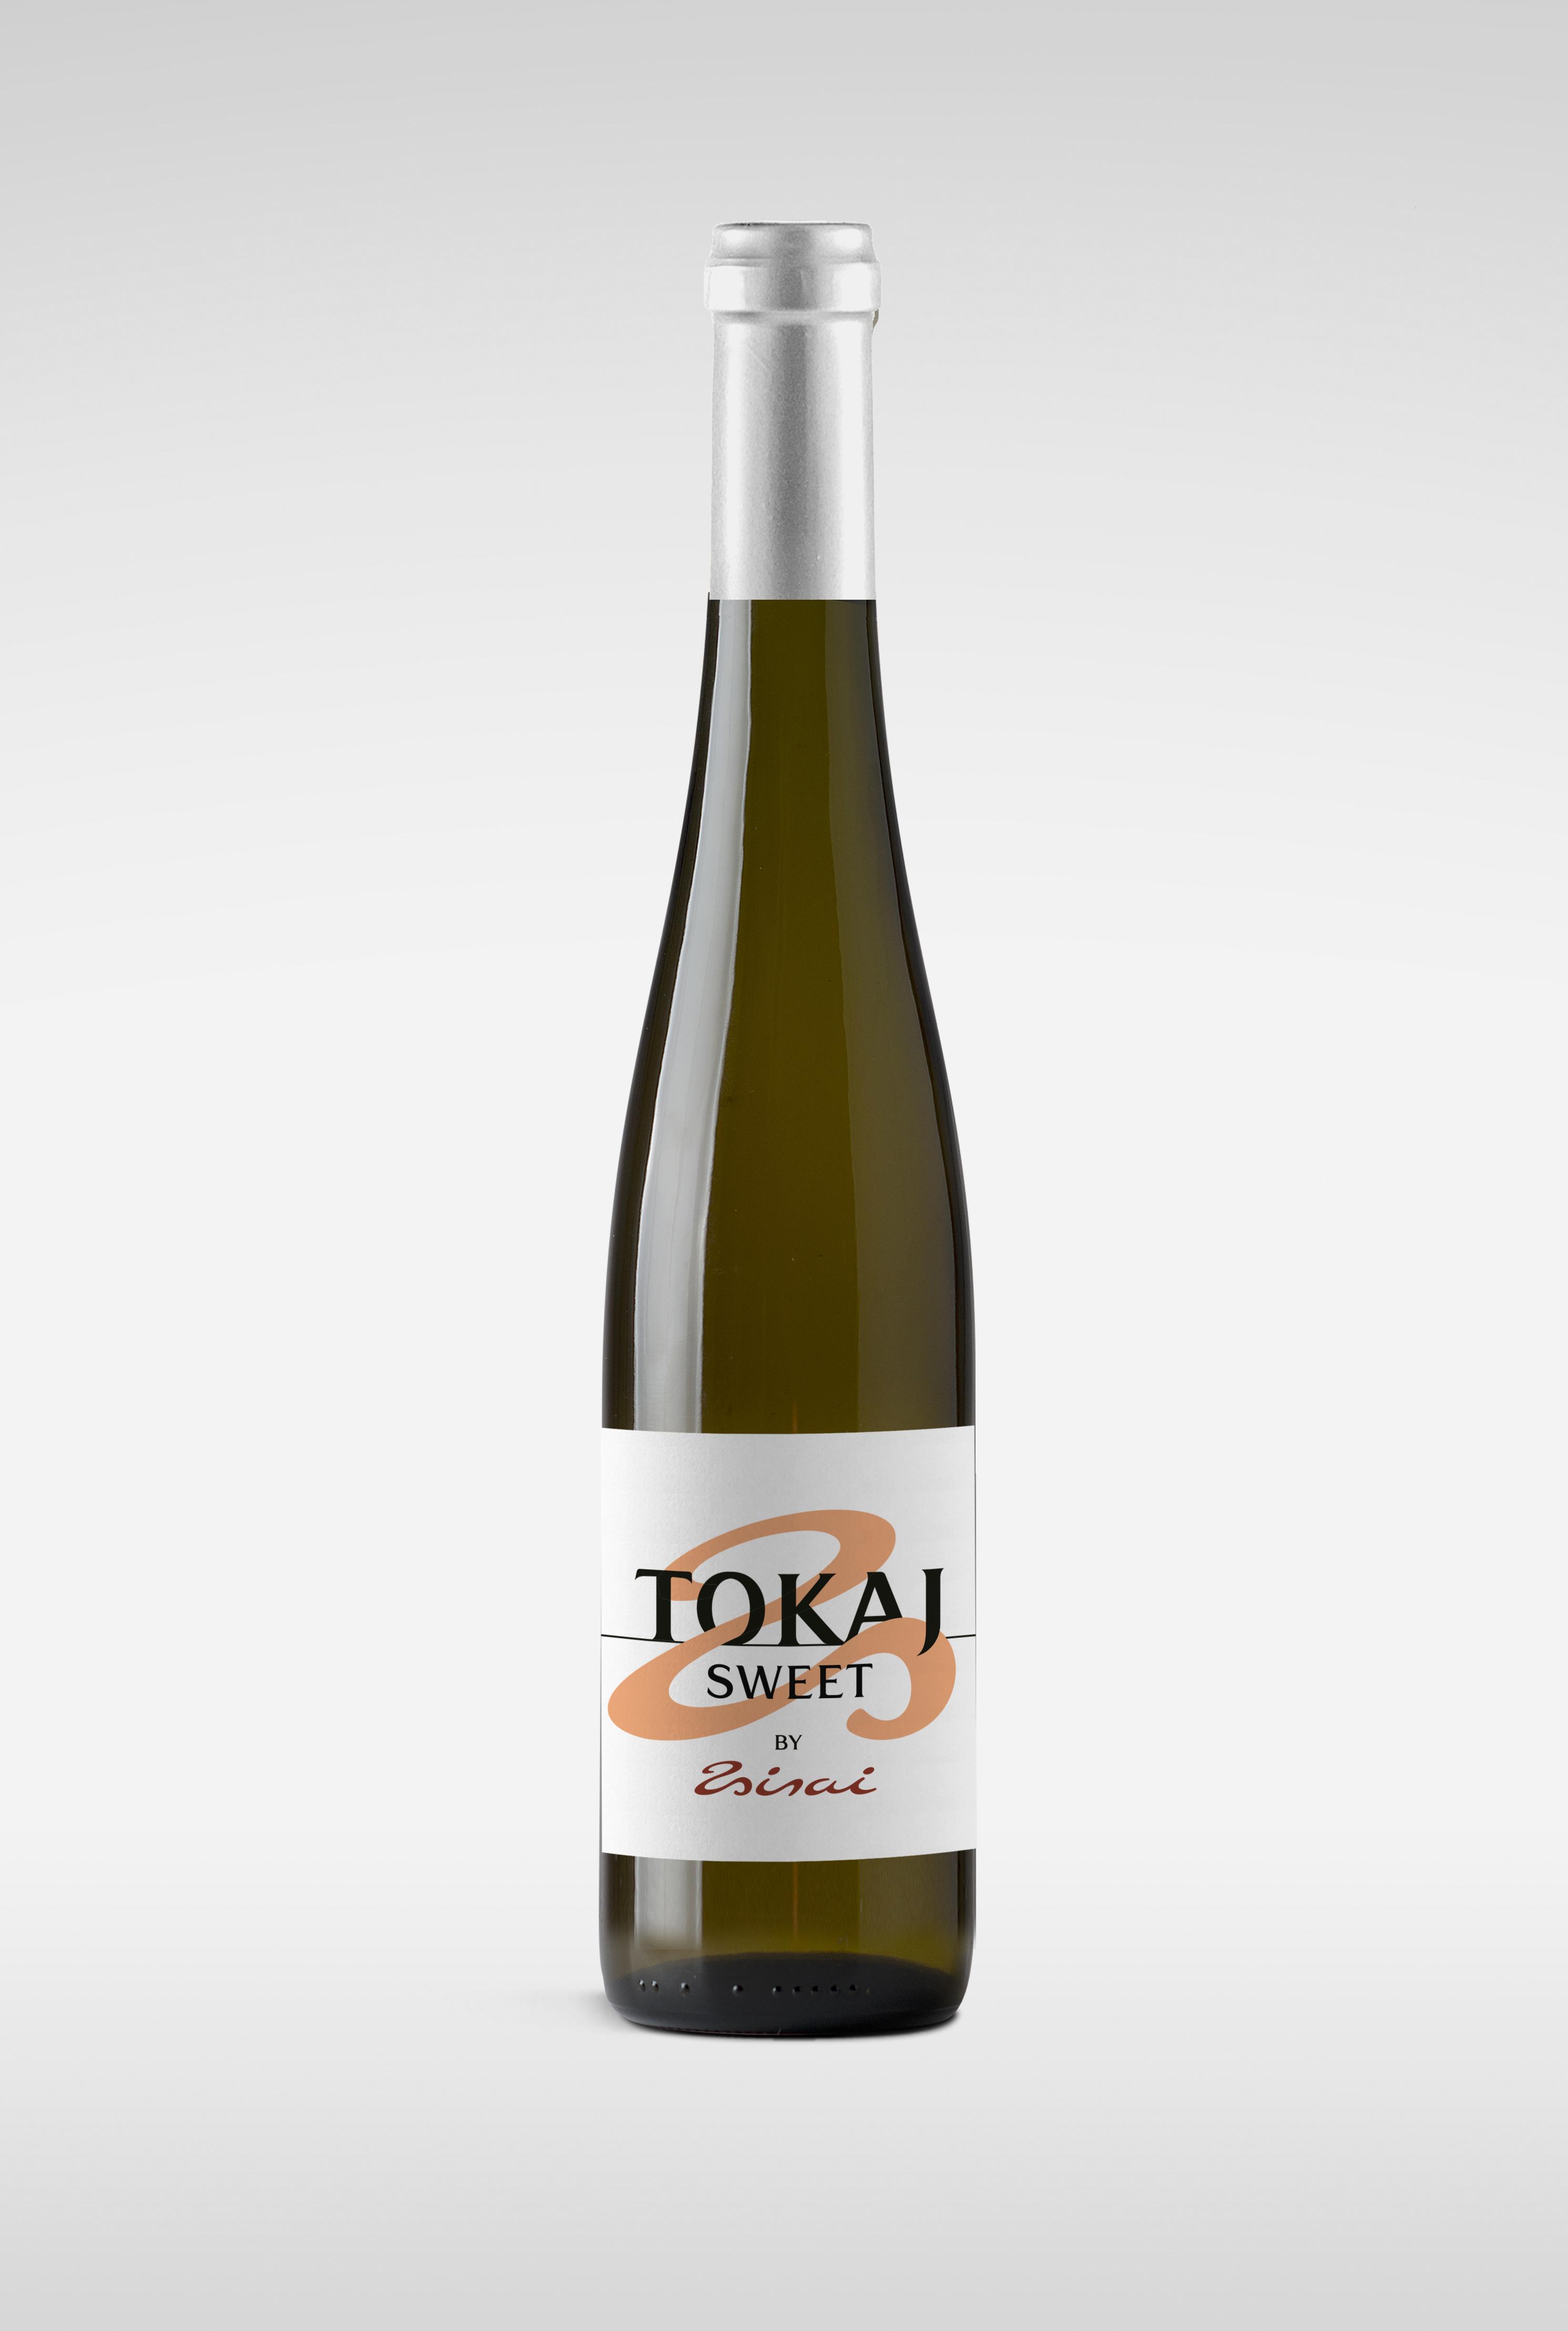 Tokaj Sweet by Zsirai 2018